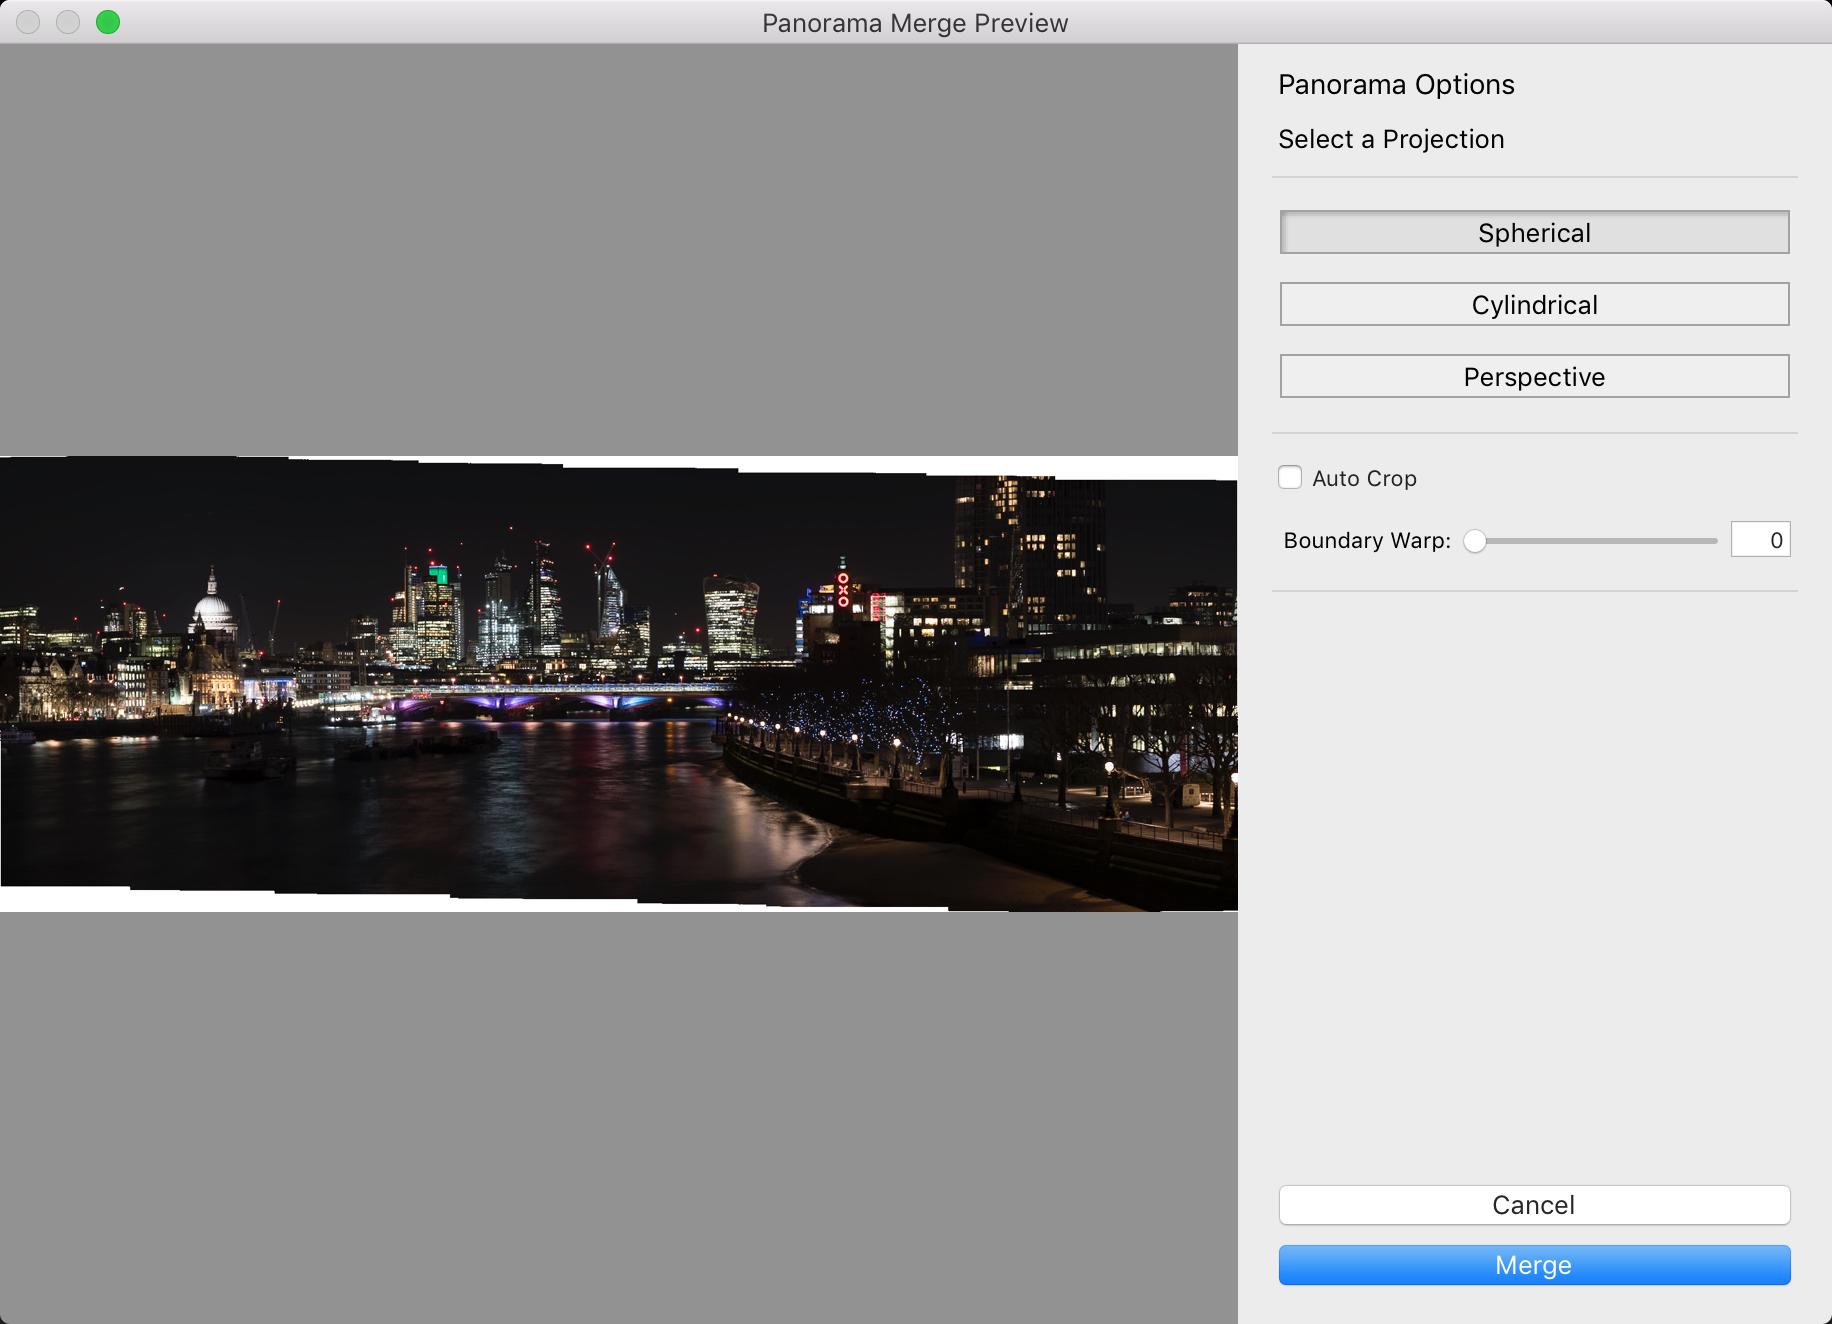 Panorama Merge Preview lightroom screen shot